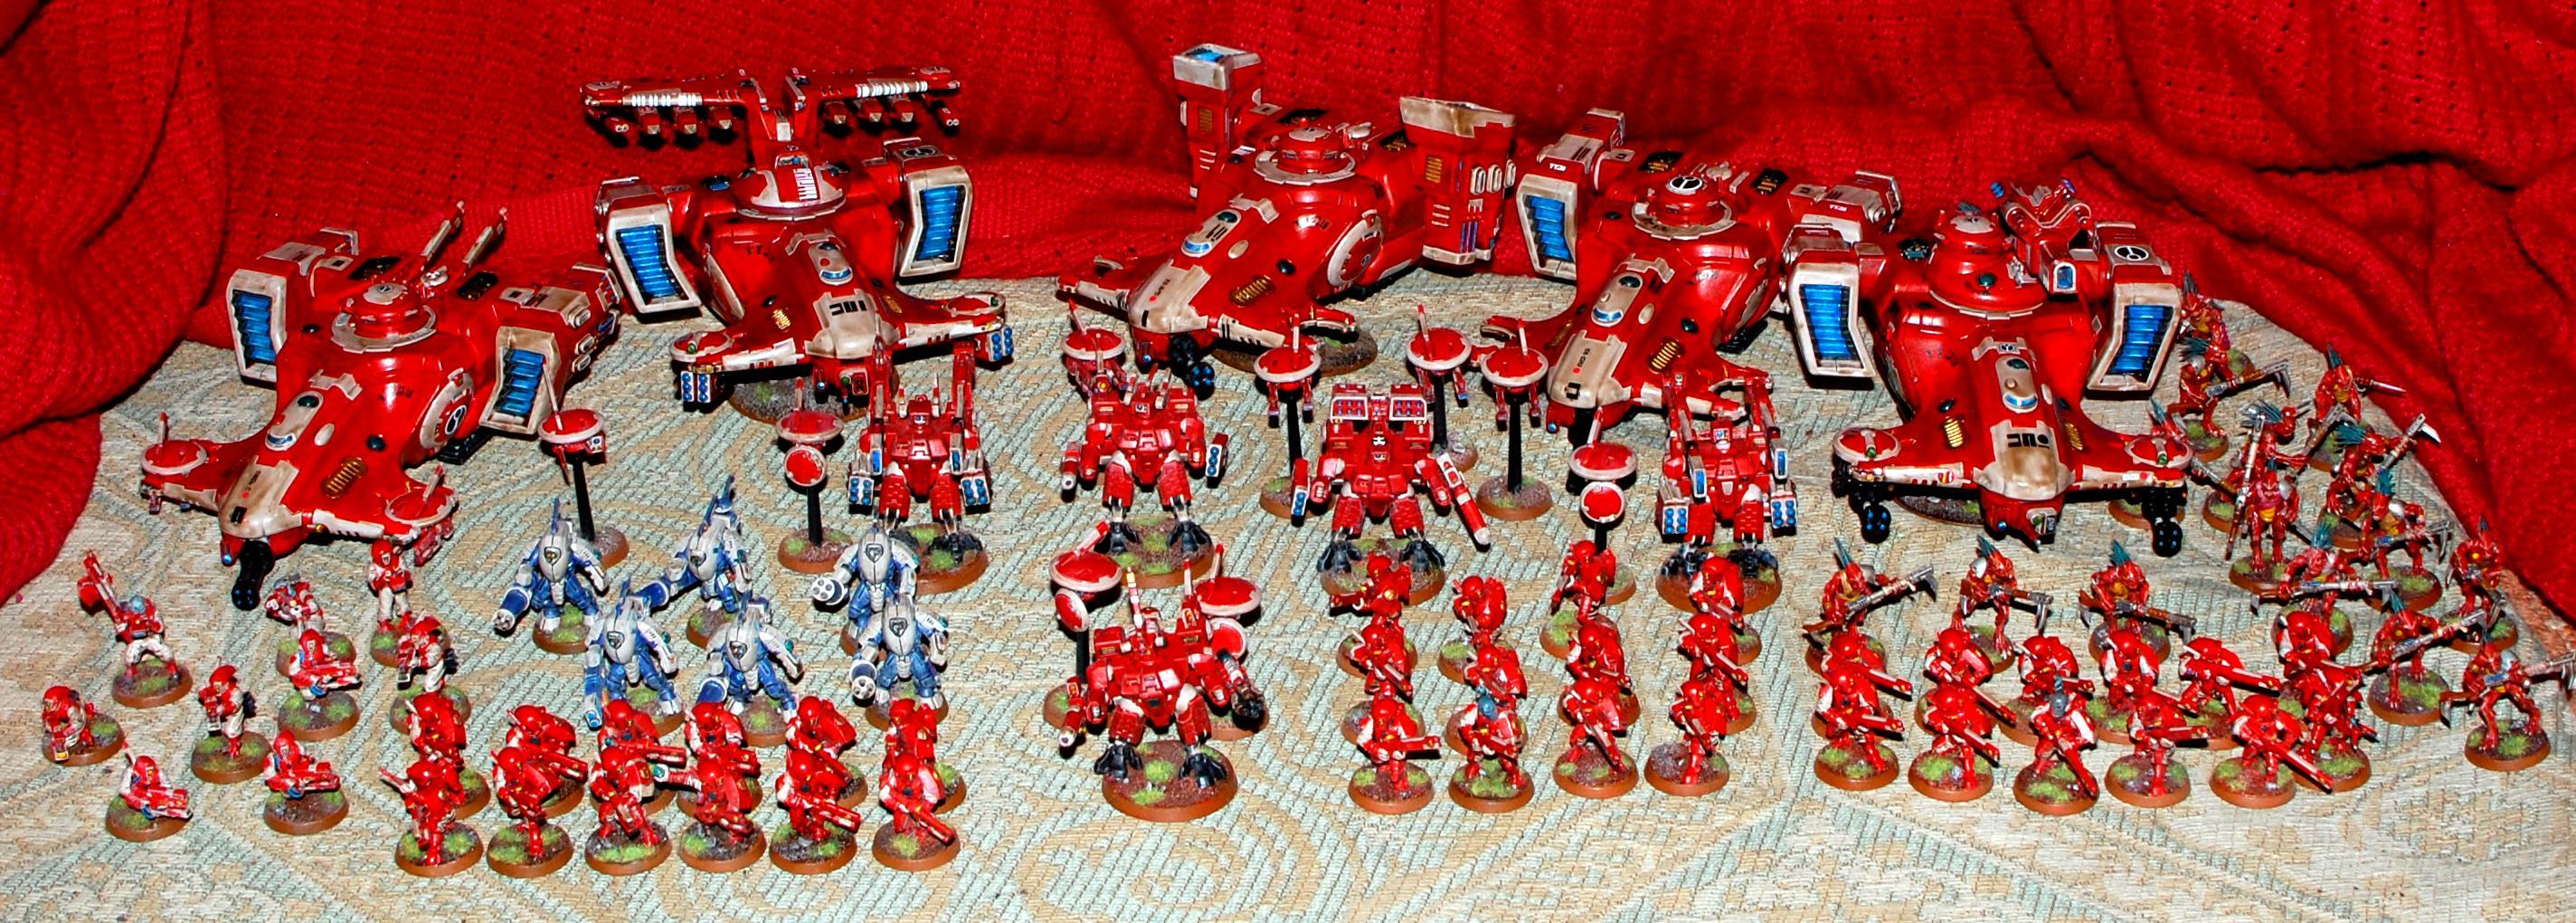 Fal'shia, Red, Sept, Tau, Warhammer 40,000